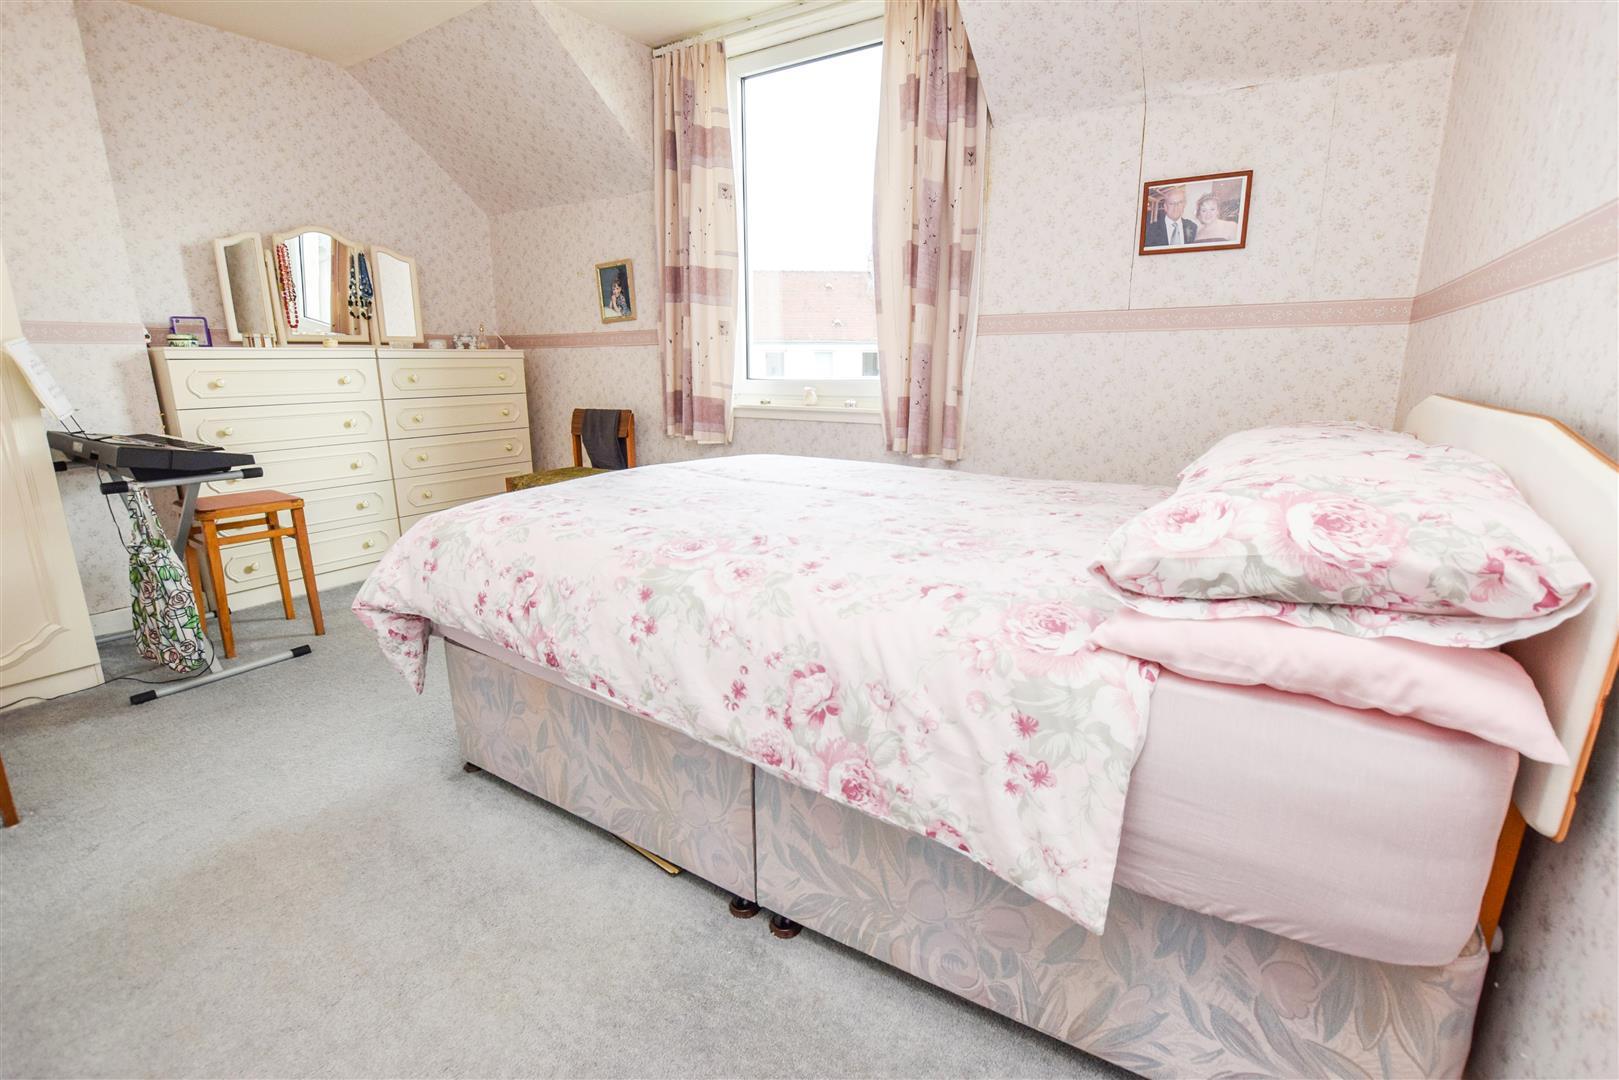 35, Alligan Road, Crieff, Perthshire, PH7 3JS, UK